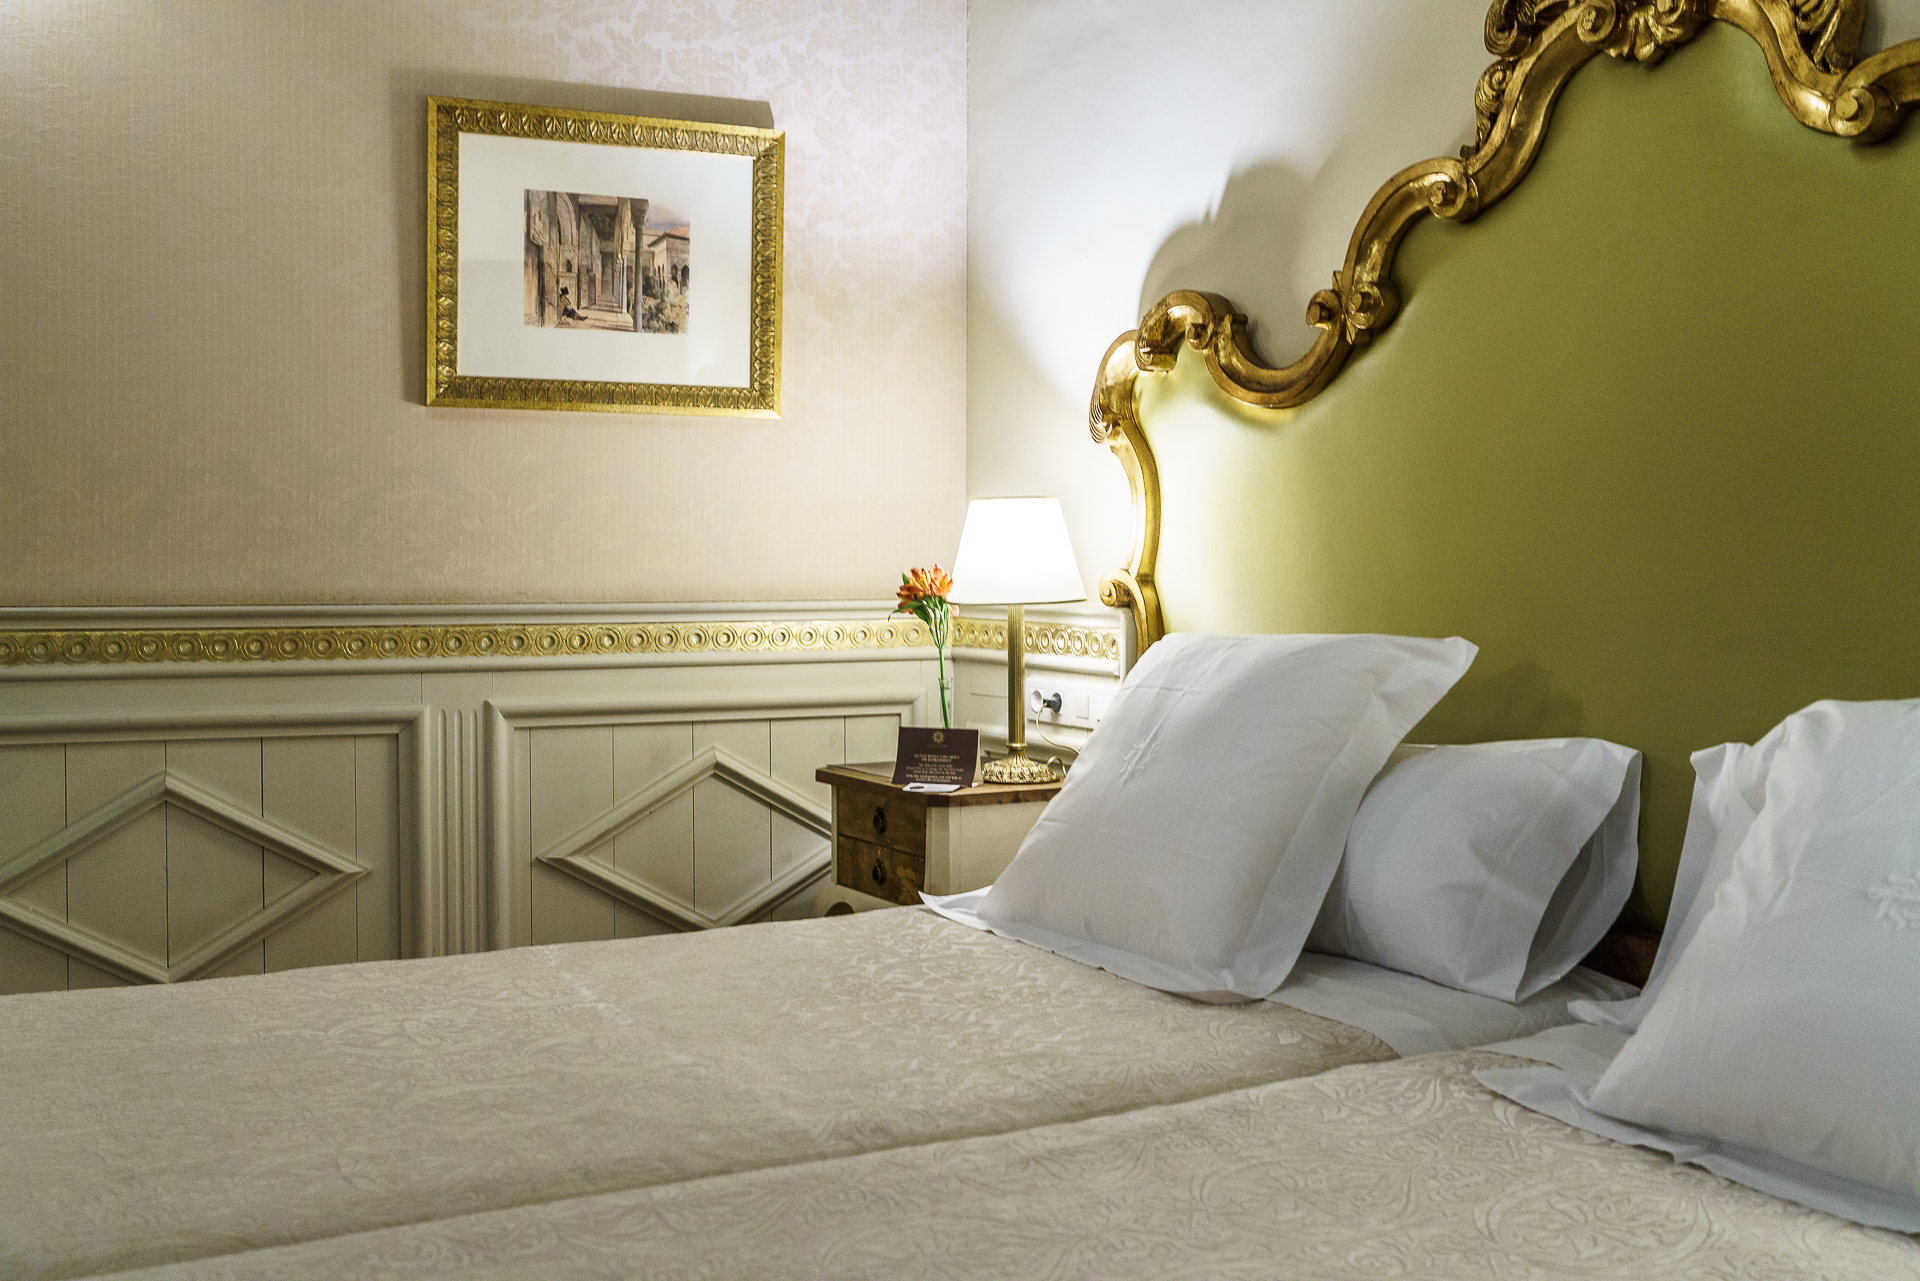 Casa-1800-Hotel-Granada